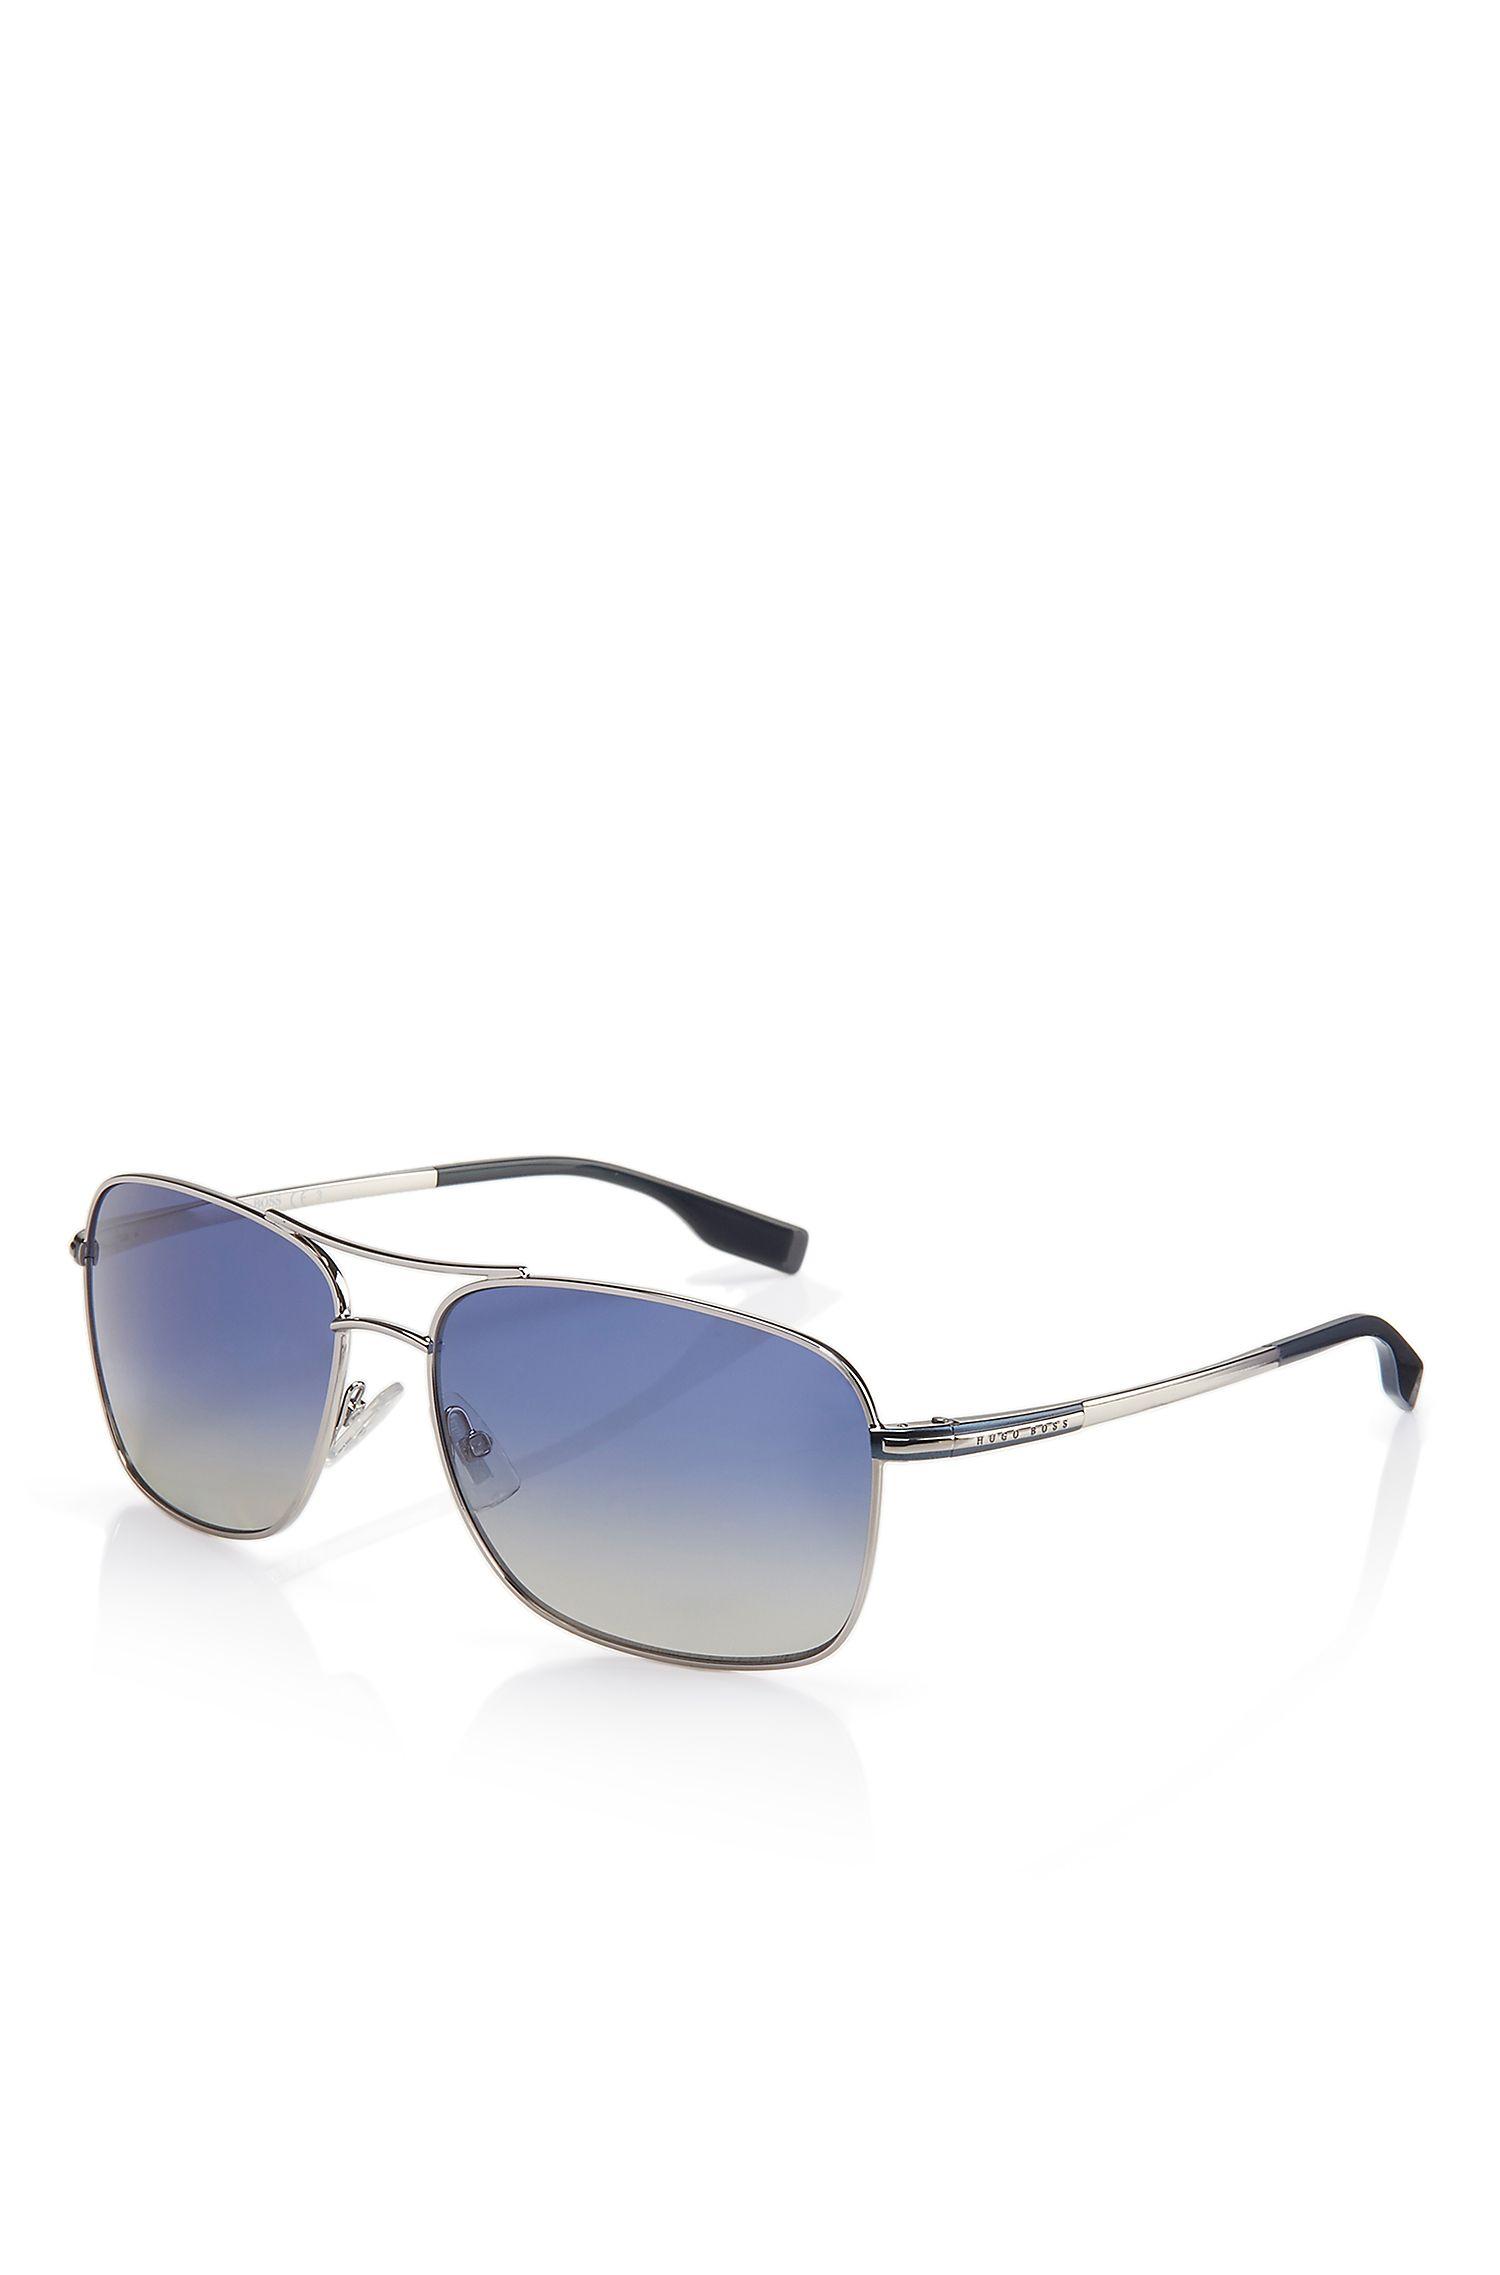 'BOSS 058PS' | Double Bridge Navigator Gradient Lens Sunglasses